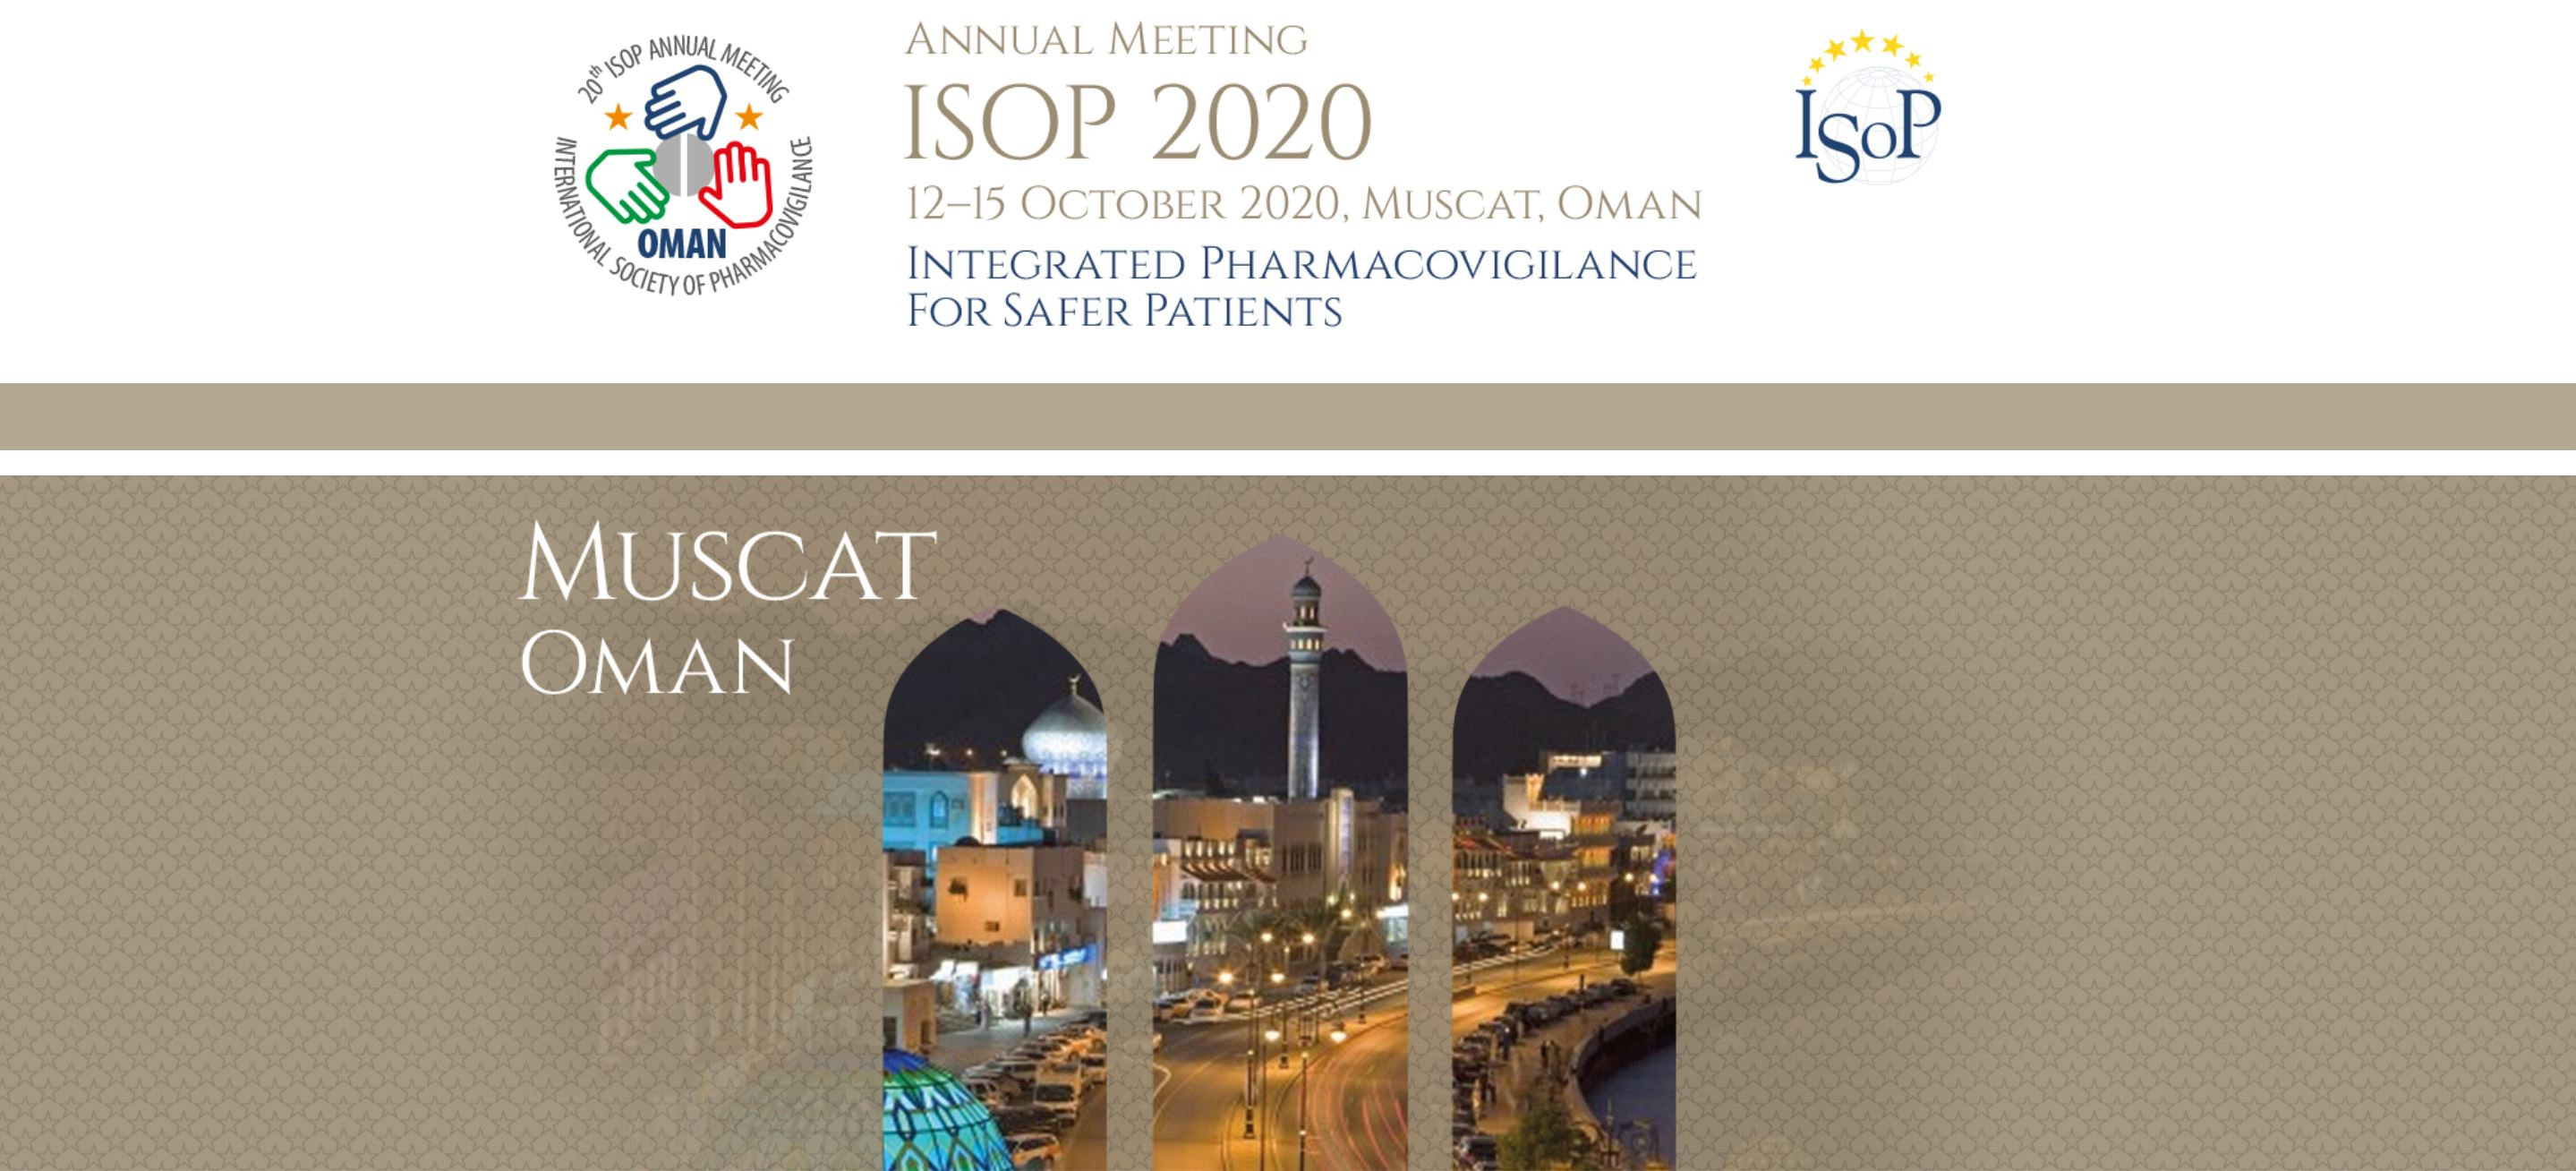 Annual Meeting  ISOP 2020